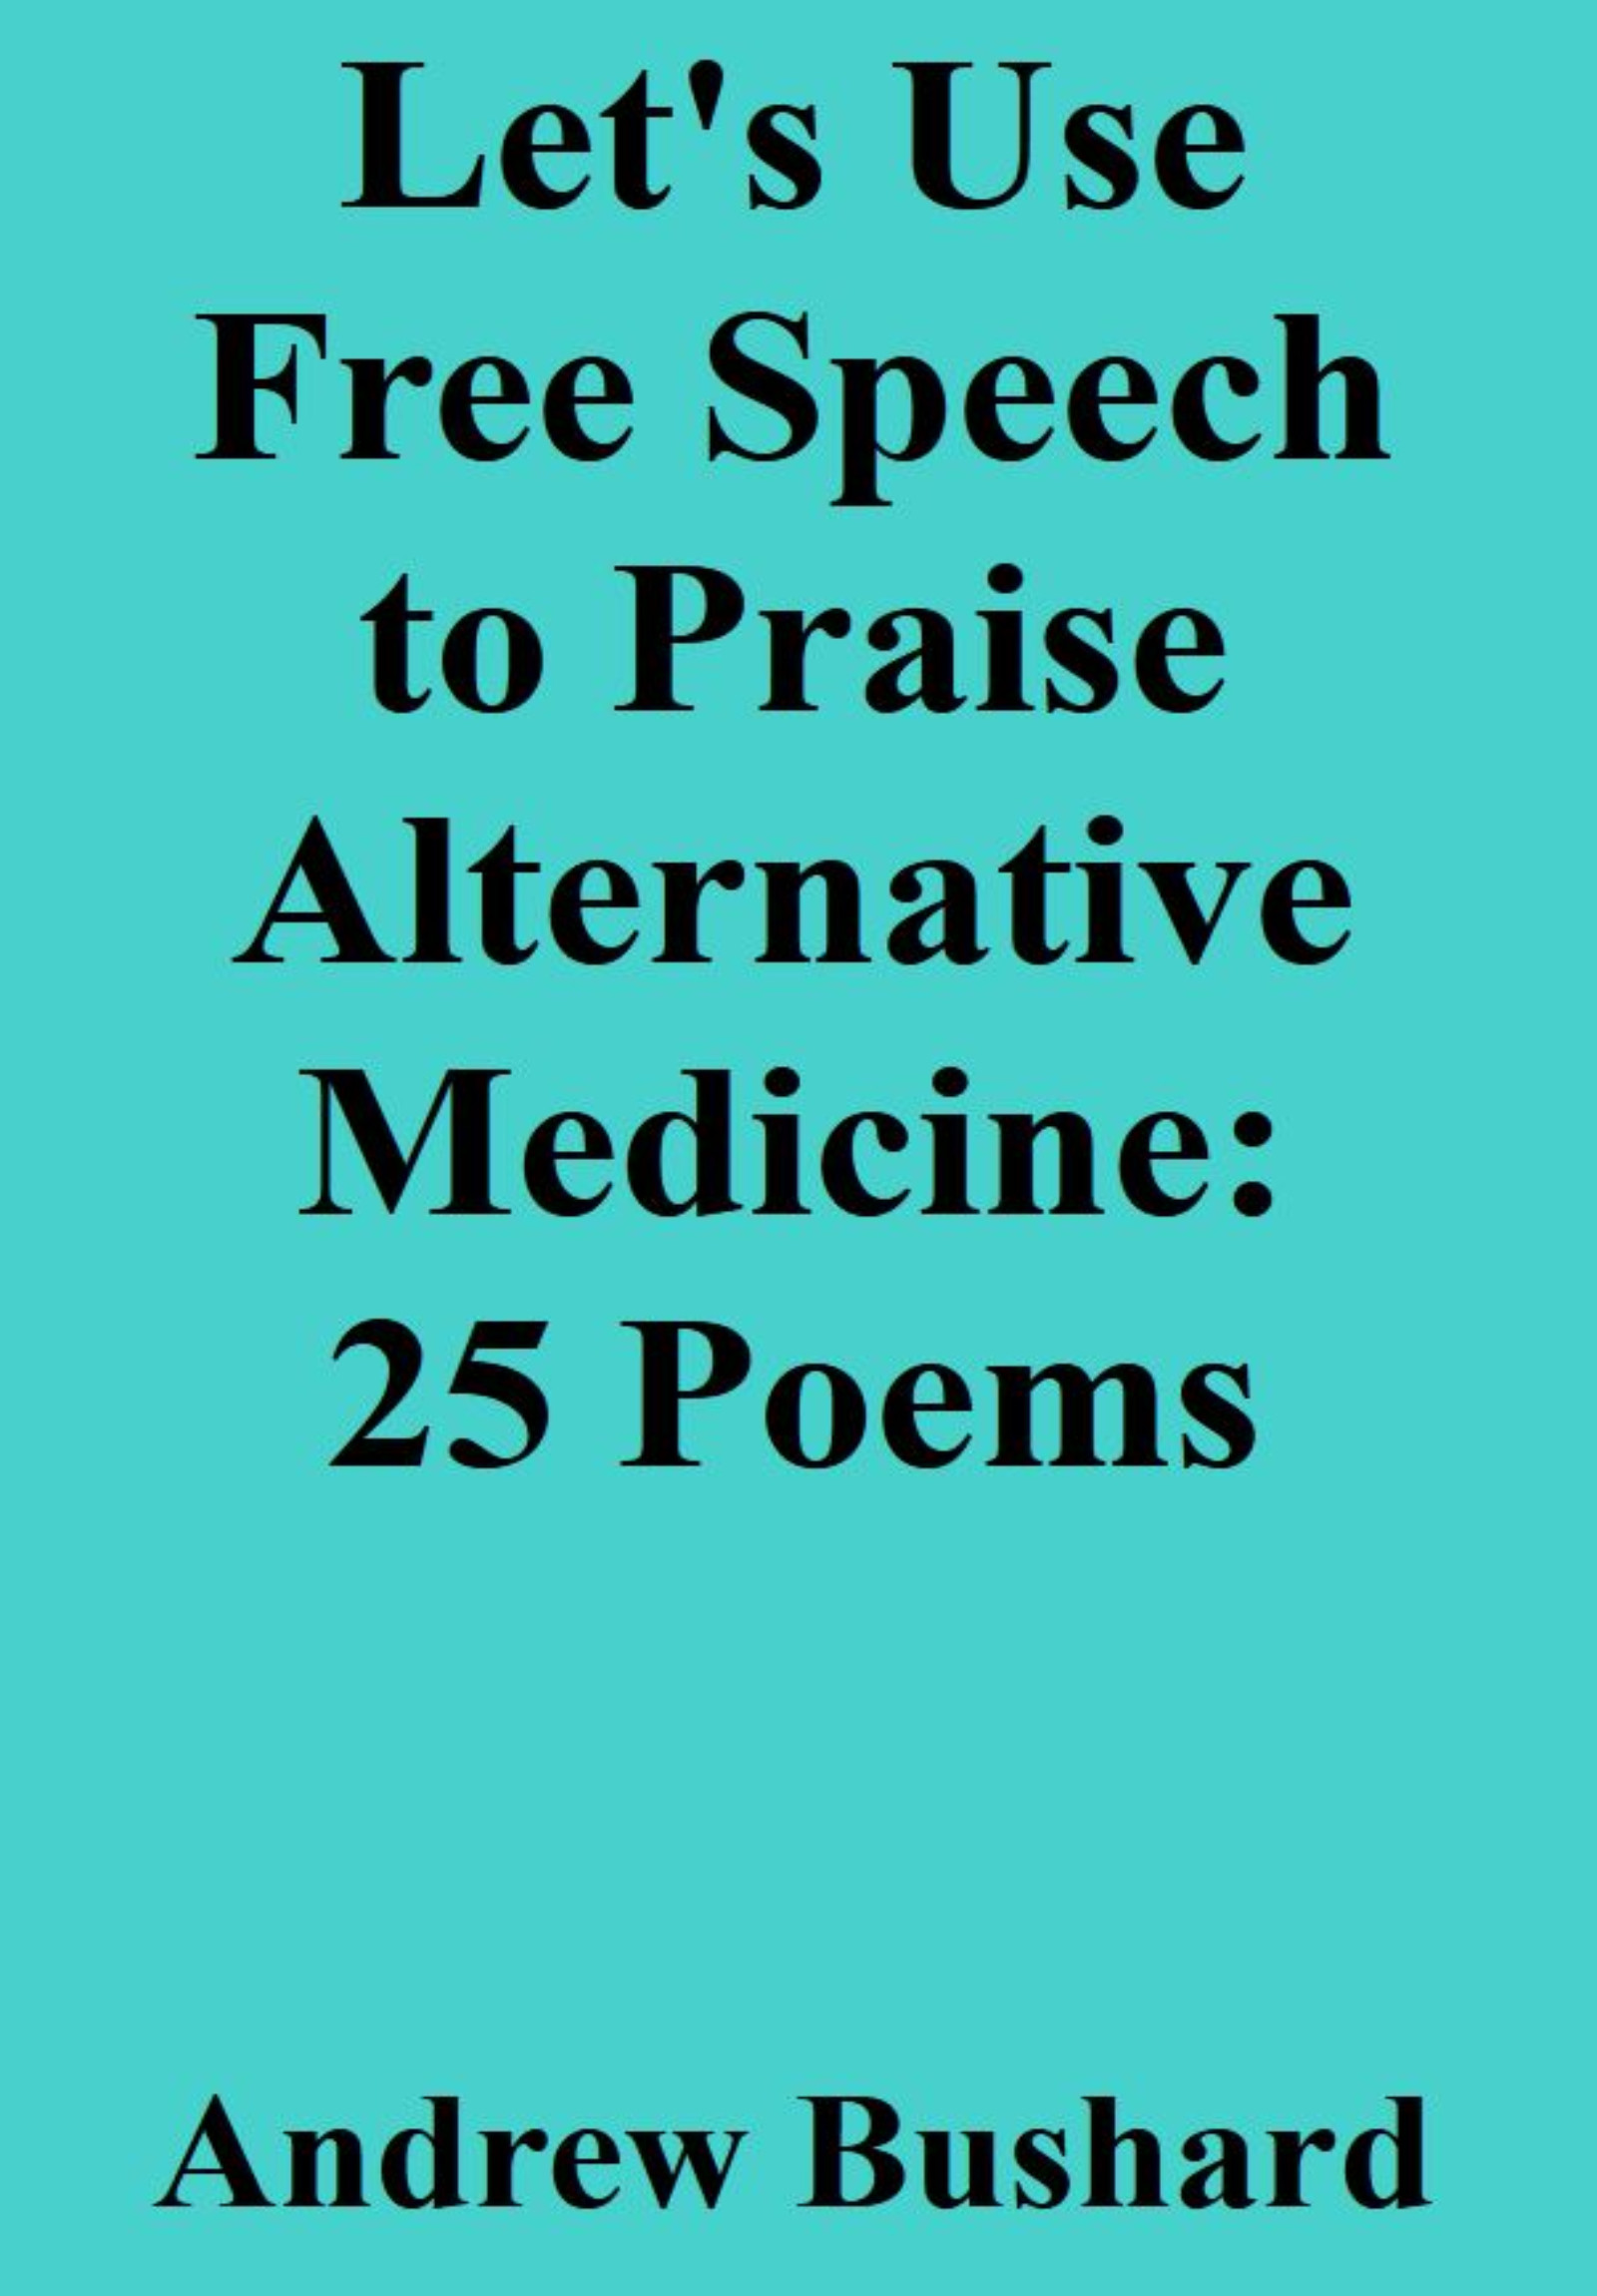 Let's Use Free Speech to Praise Alternative Medicine: 25 Poems